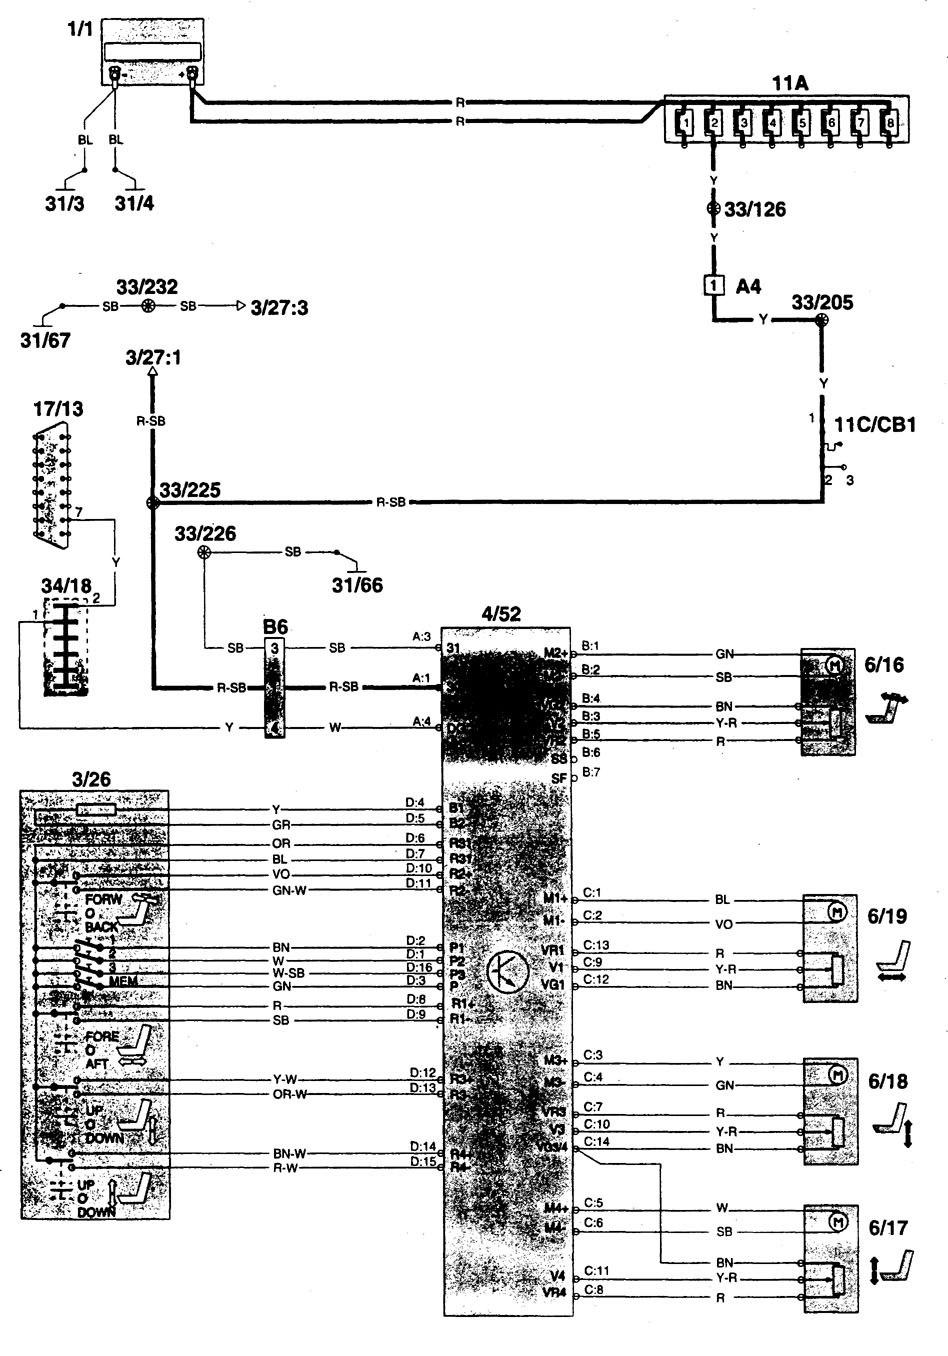 volvo 960  1996  - wiring diagrams - power seats